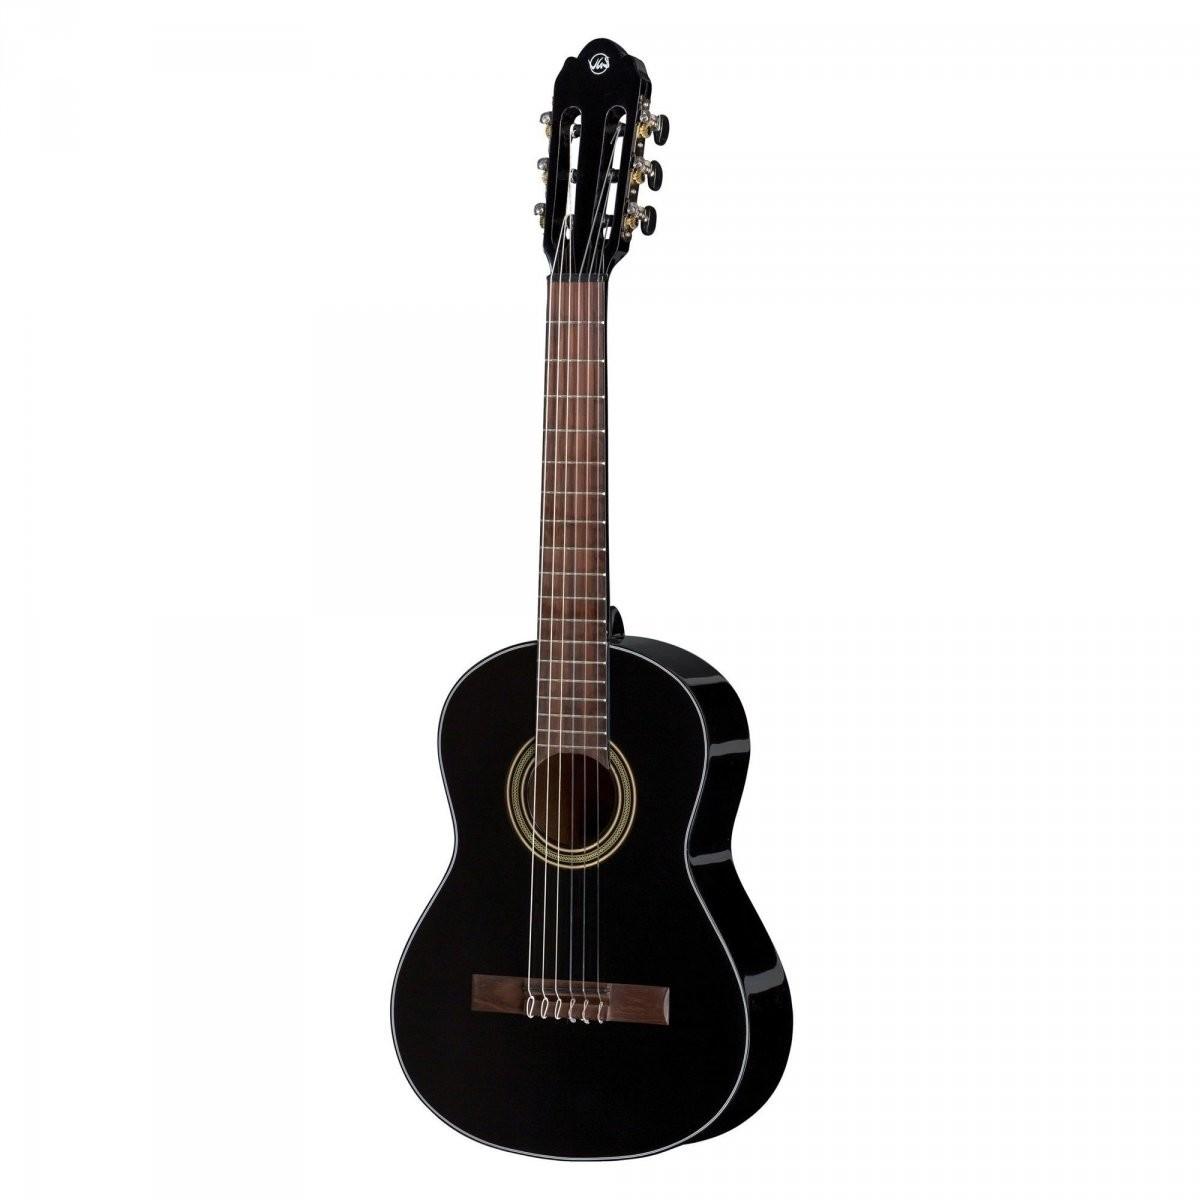 Gewa 500112 BL gitara klasyczna 1/2